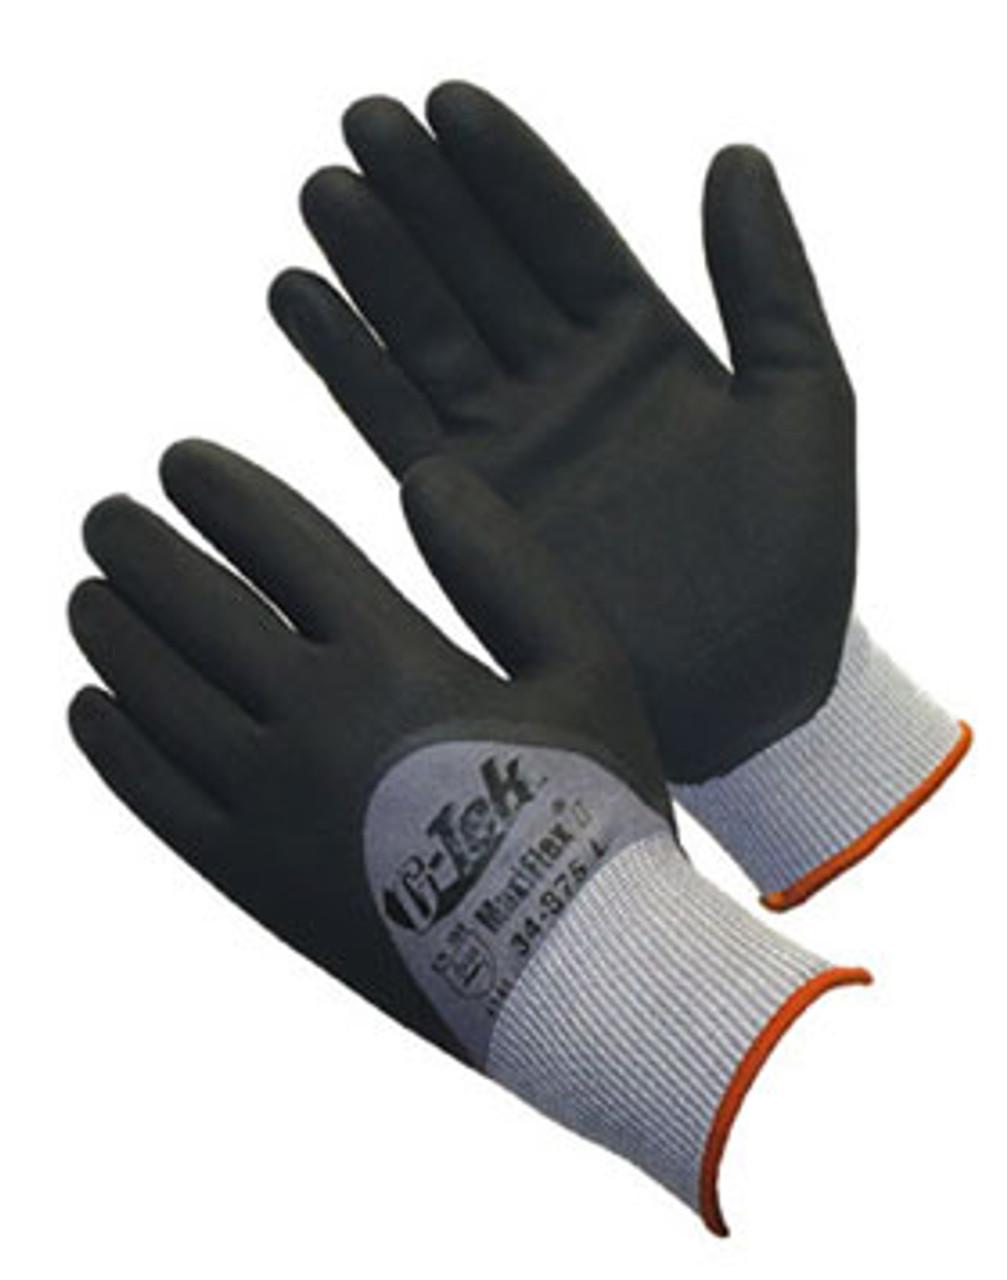 G Tek Maxiflex Ii Gloves Calolympic Safety